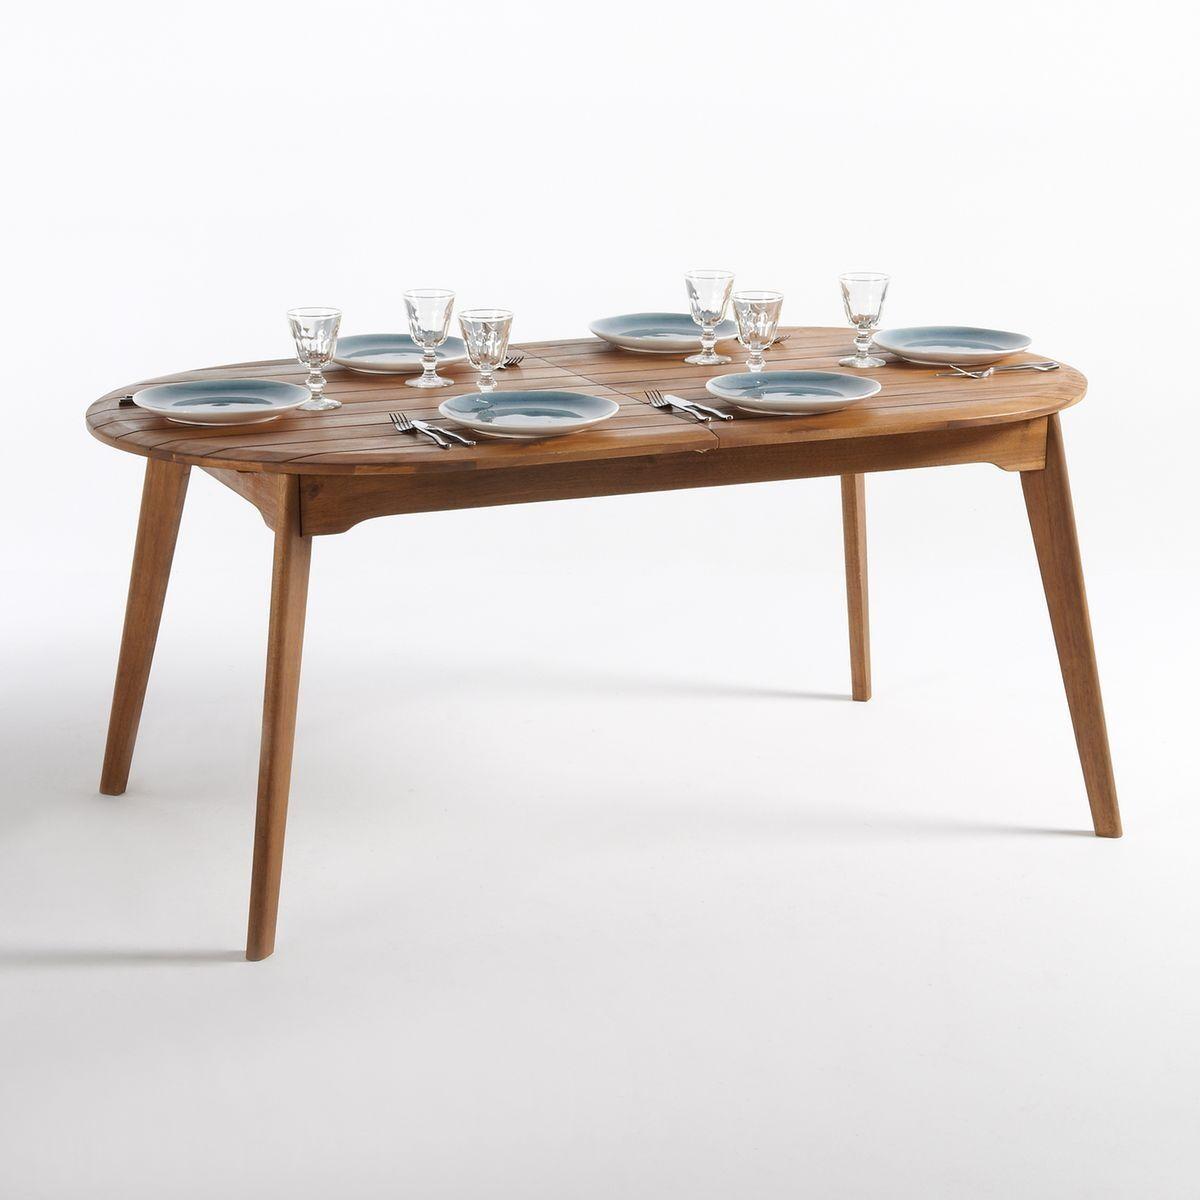 La Redoute Table de jardin acacia FSC®, Julma - LA REDOUTE INTERIEURS